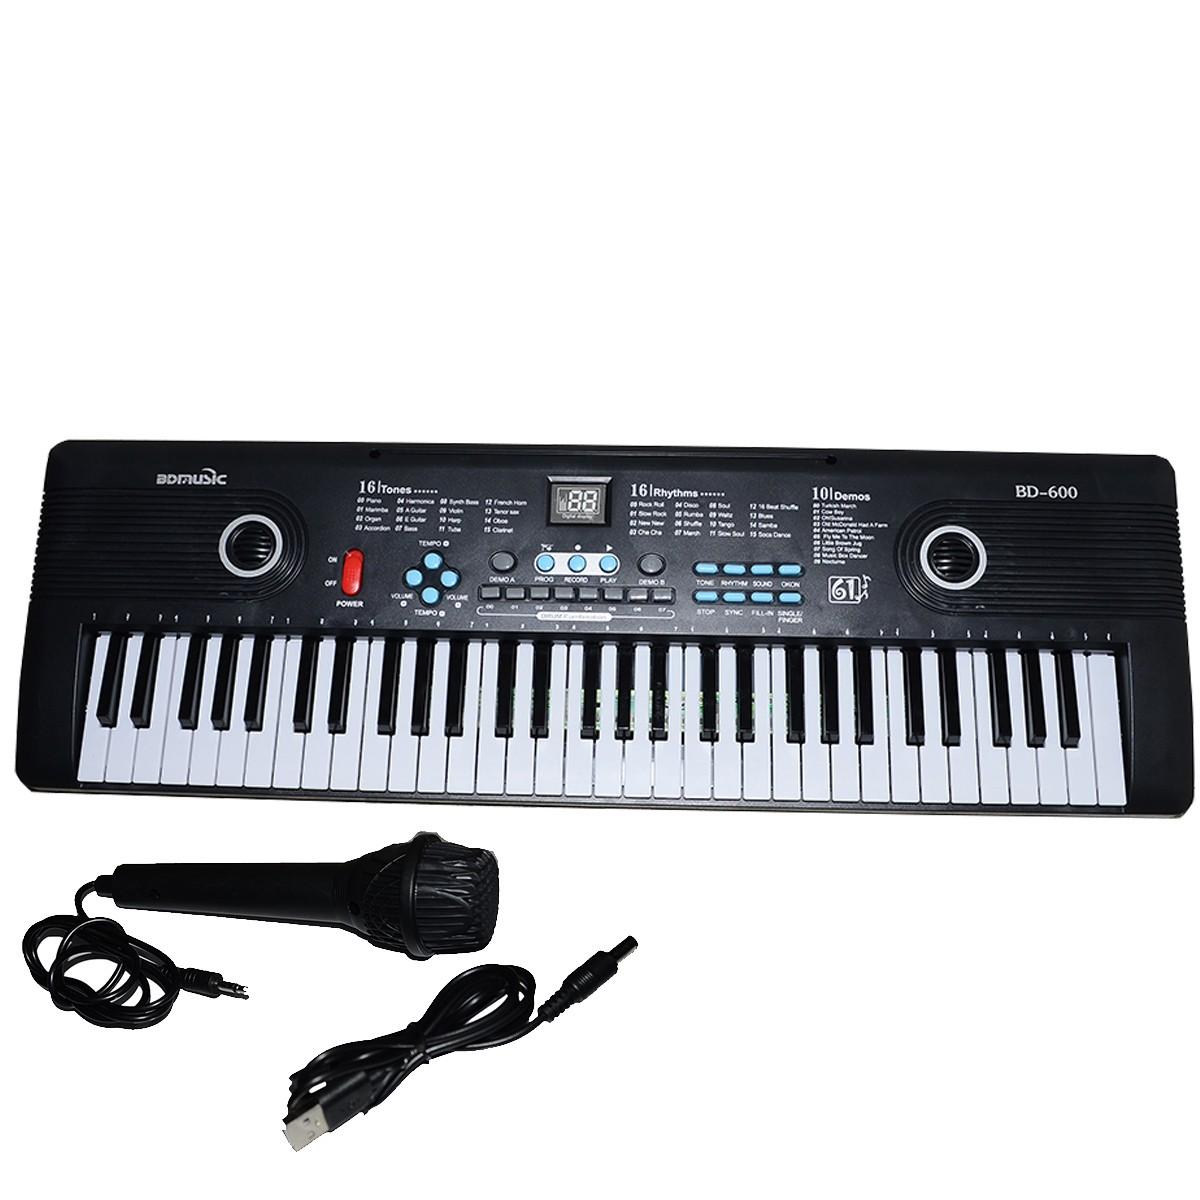 TECLADO MUSICAL 61 TECLAS INICIANTE COM MICROFONE E USB